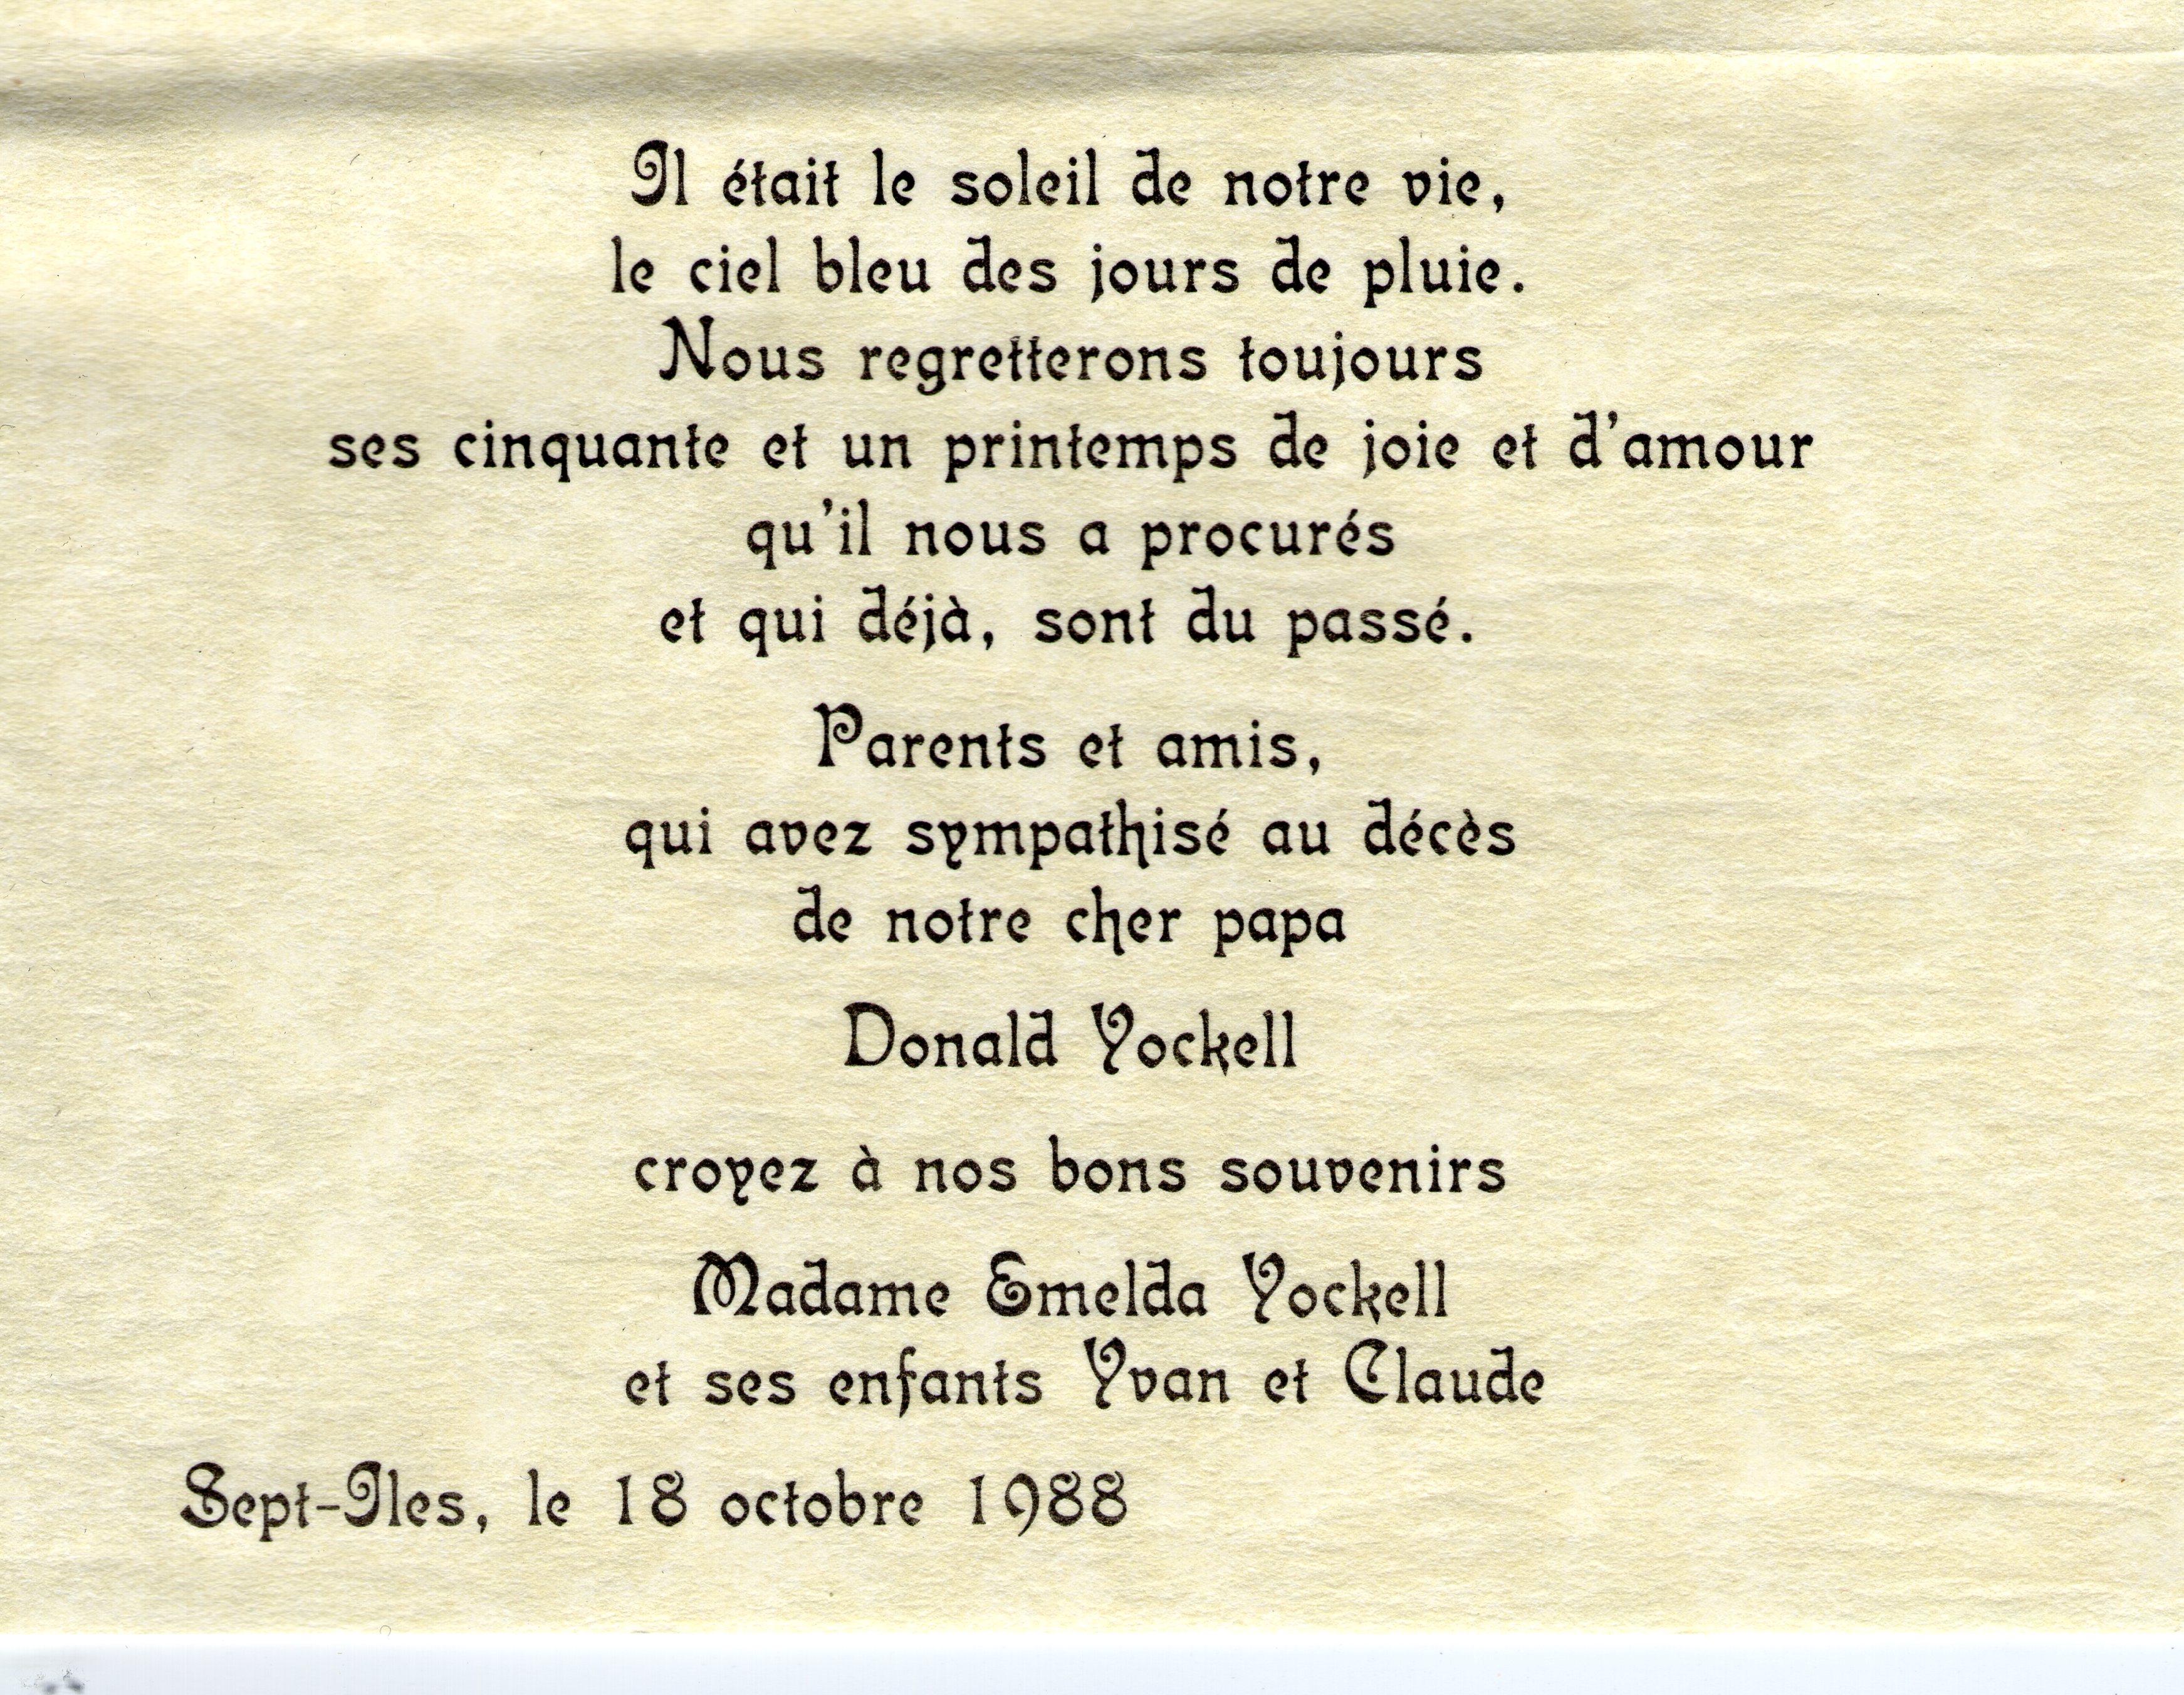 Donald Yockell